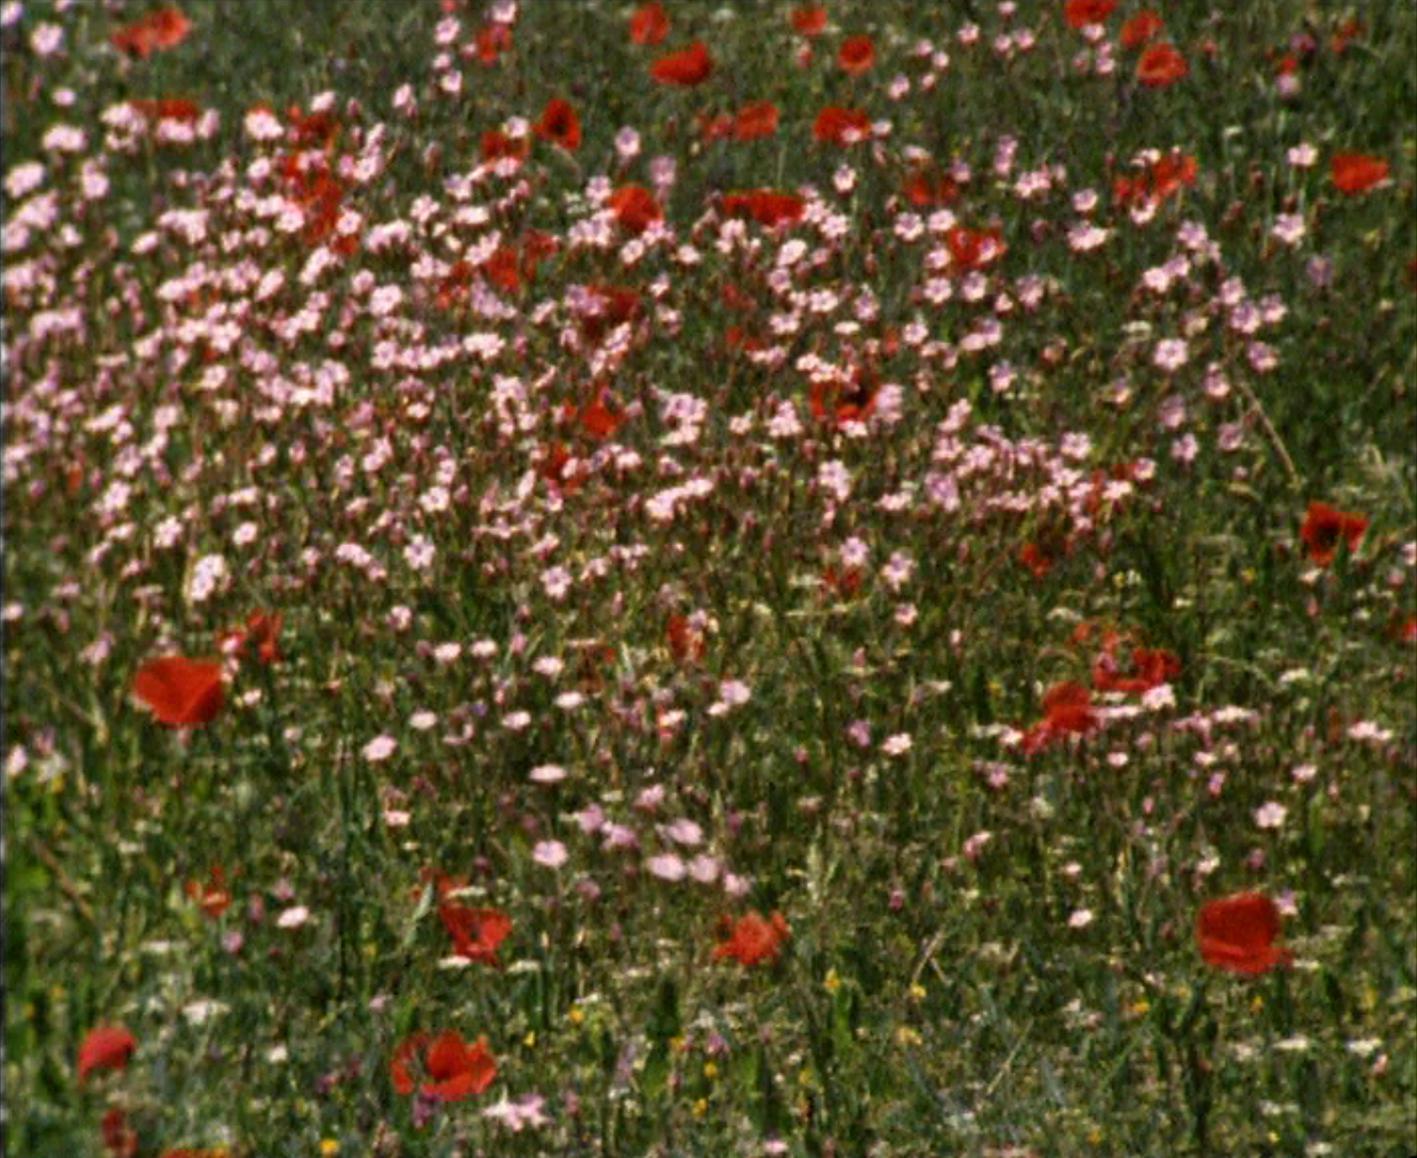 2021.01_RoseLowder_Film still 03_Bouquet2